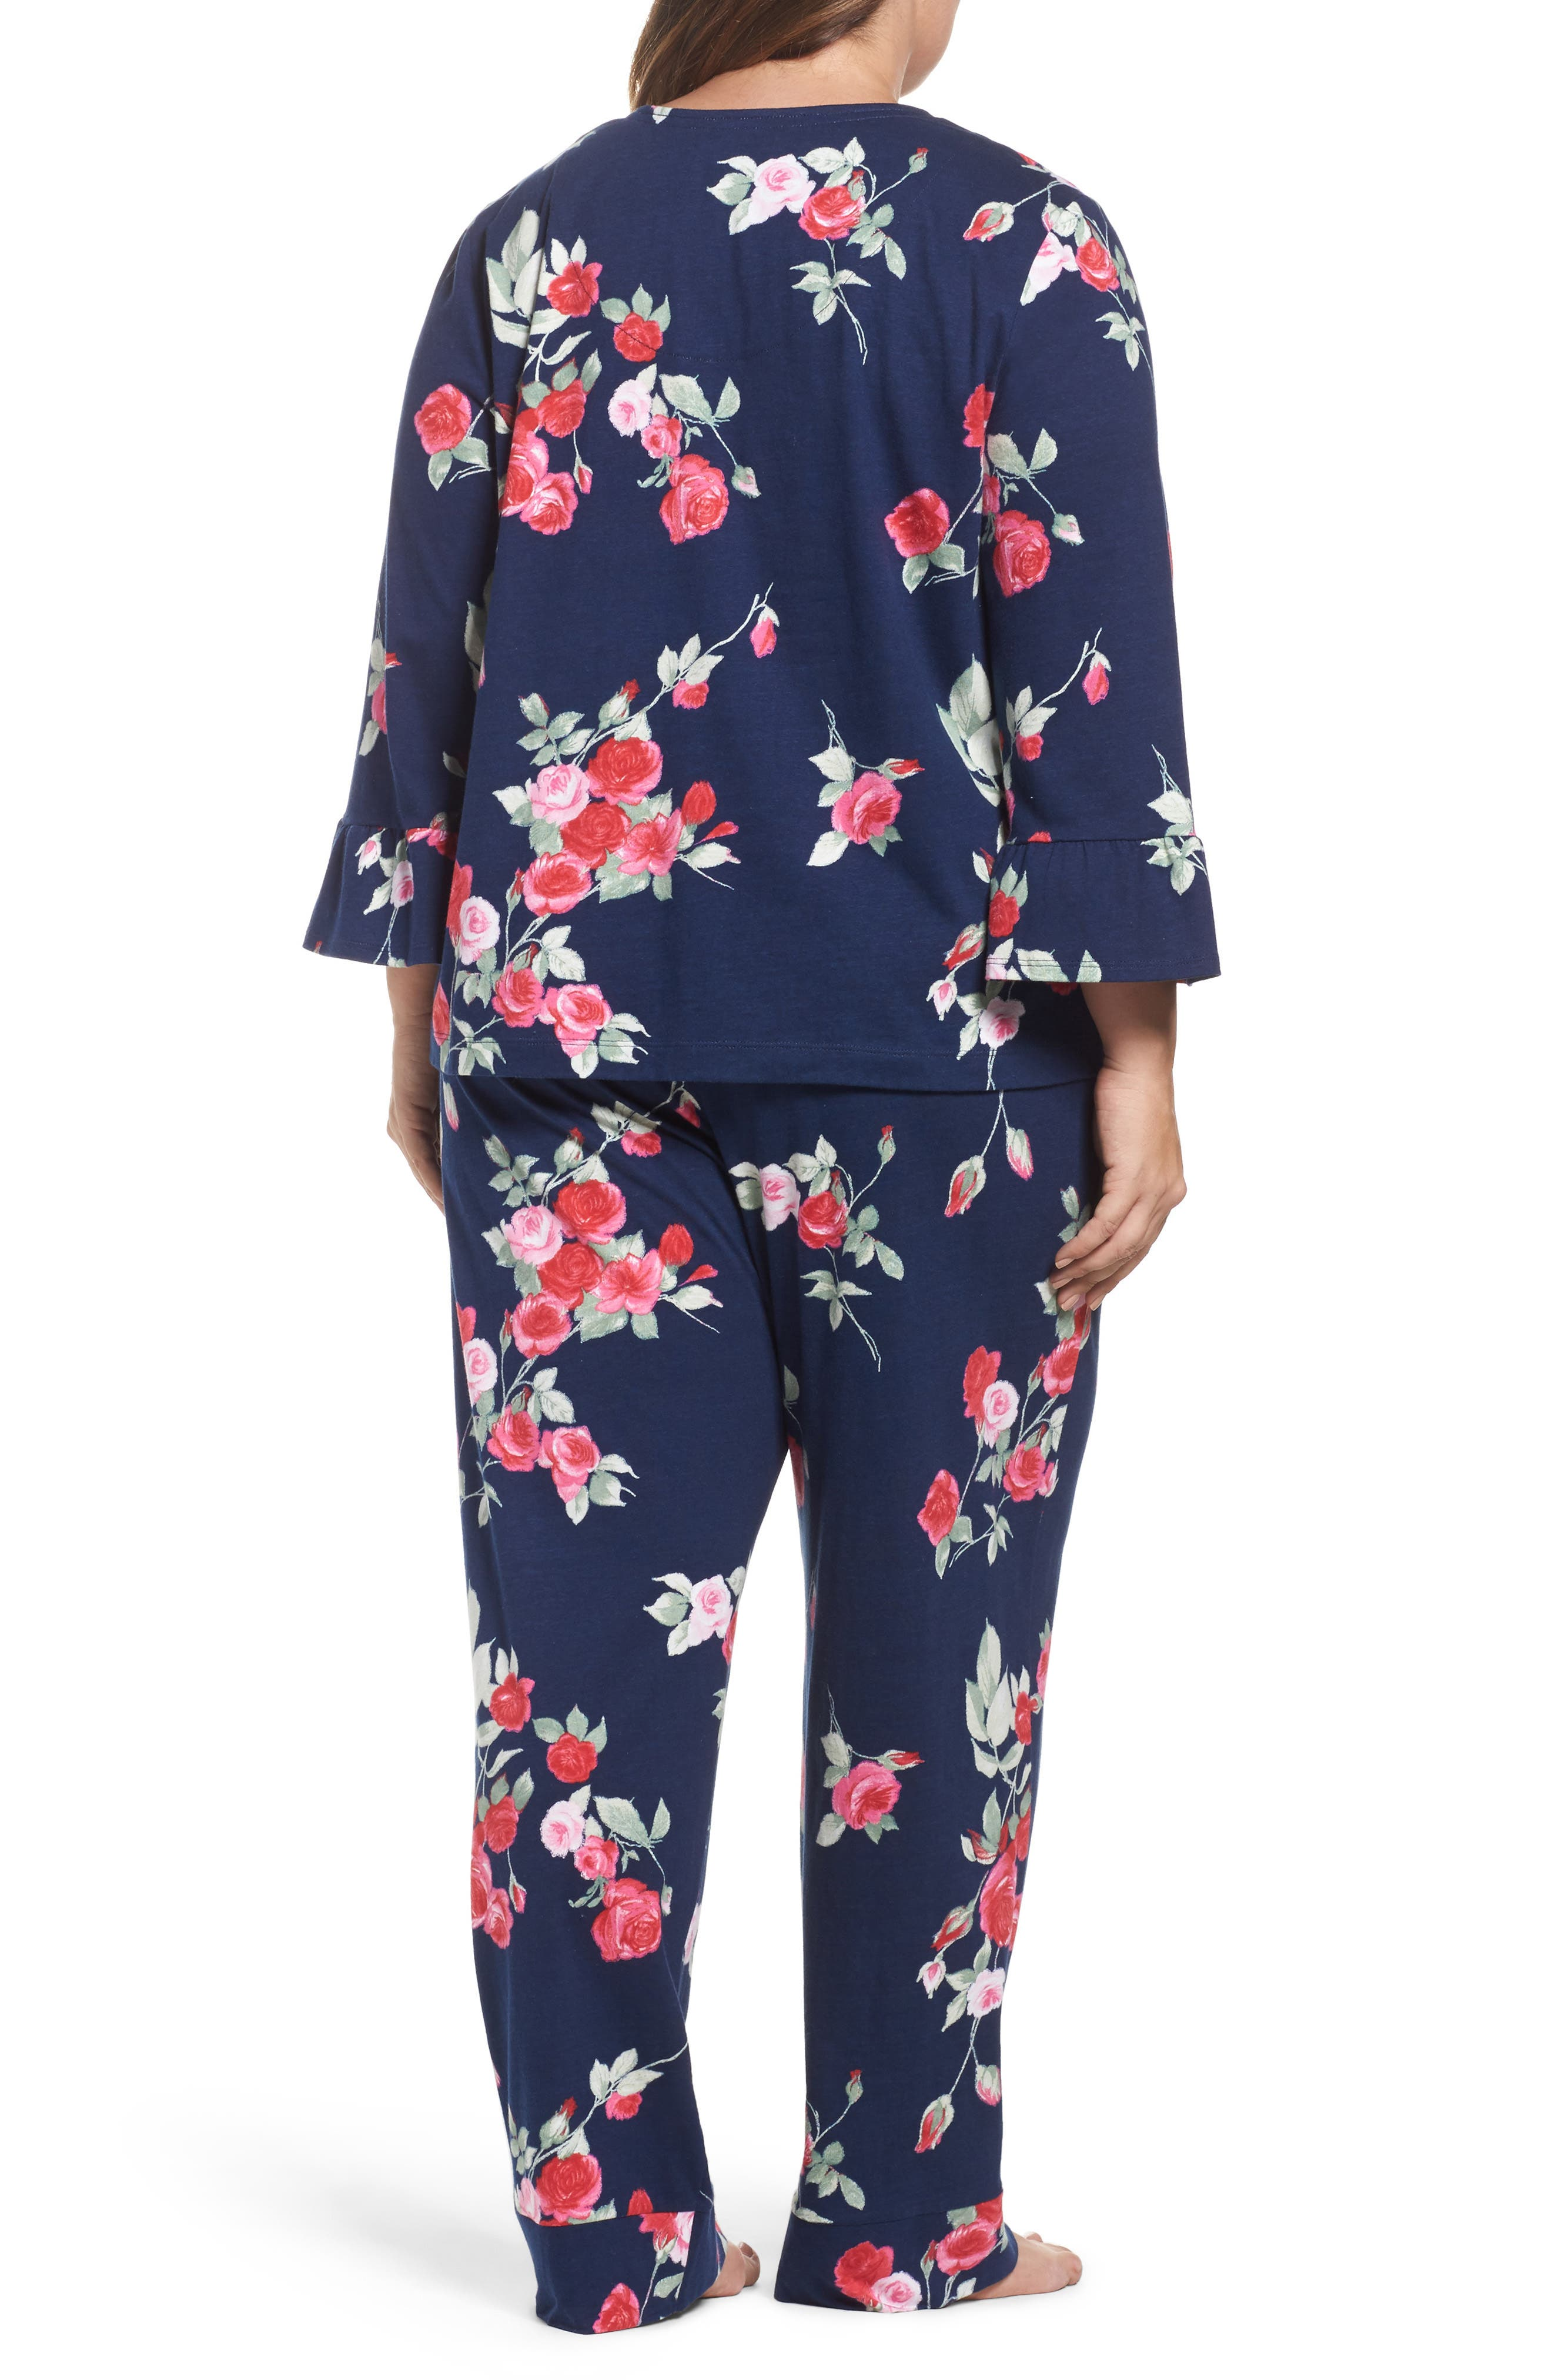 Floral Print Pajamas,                             Alternate thumbnail 2, color,                             Painted Rose